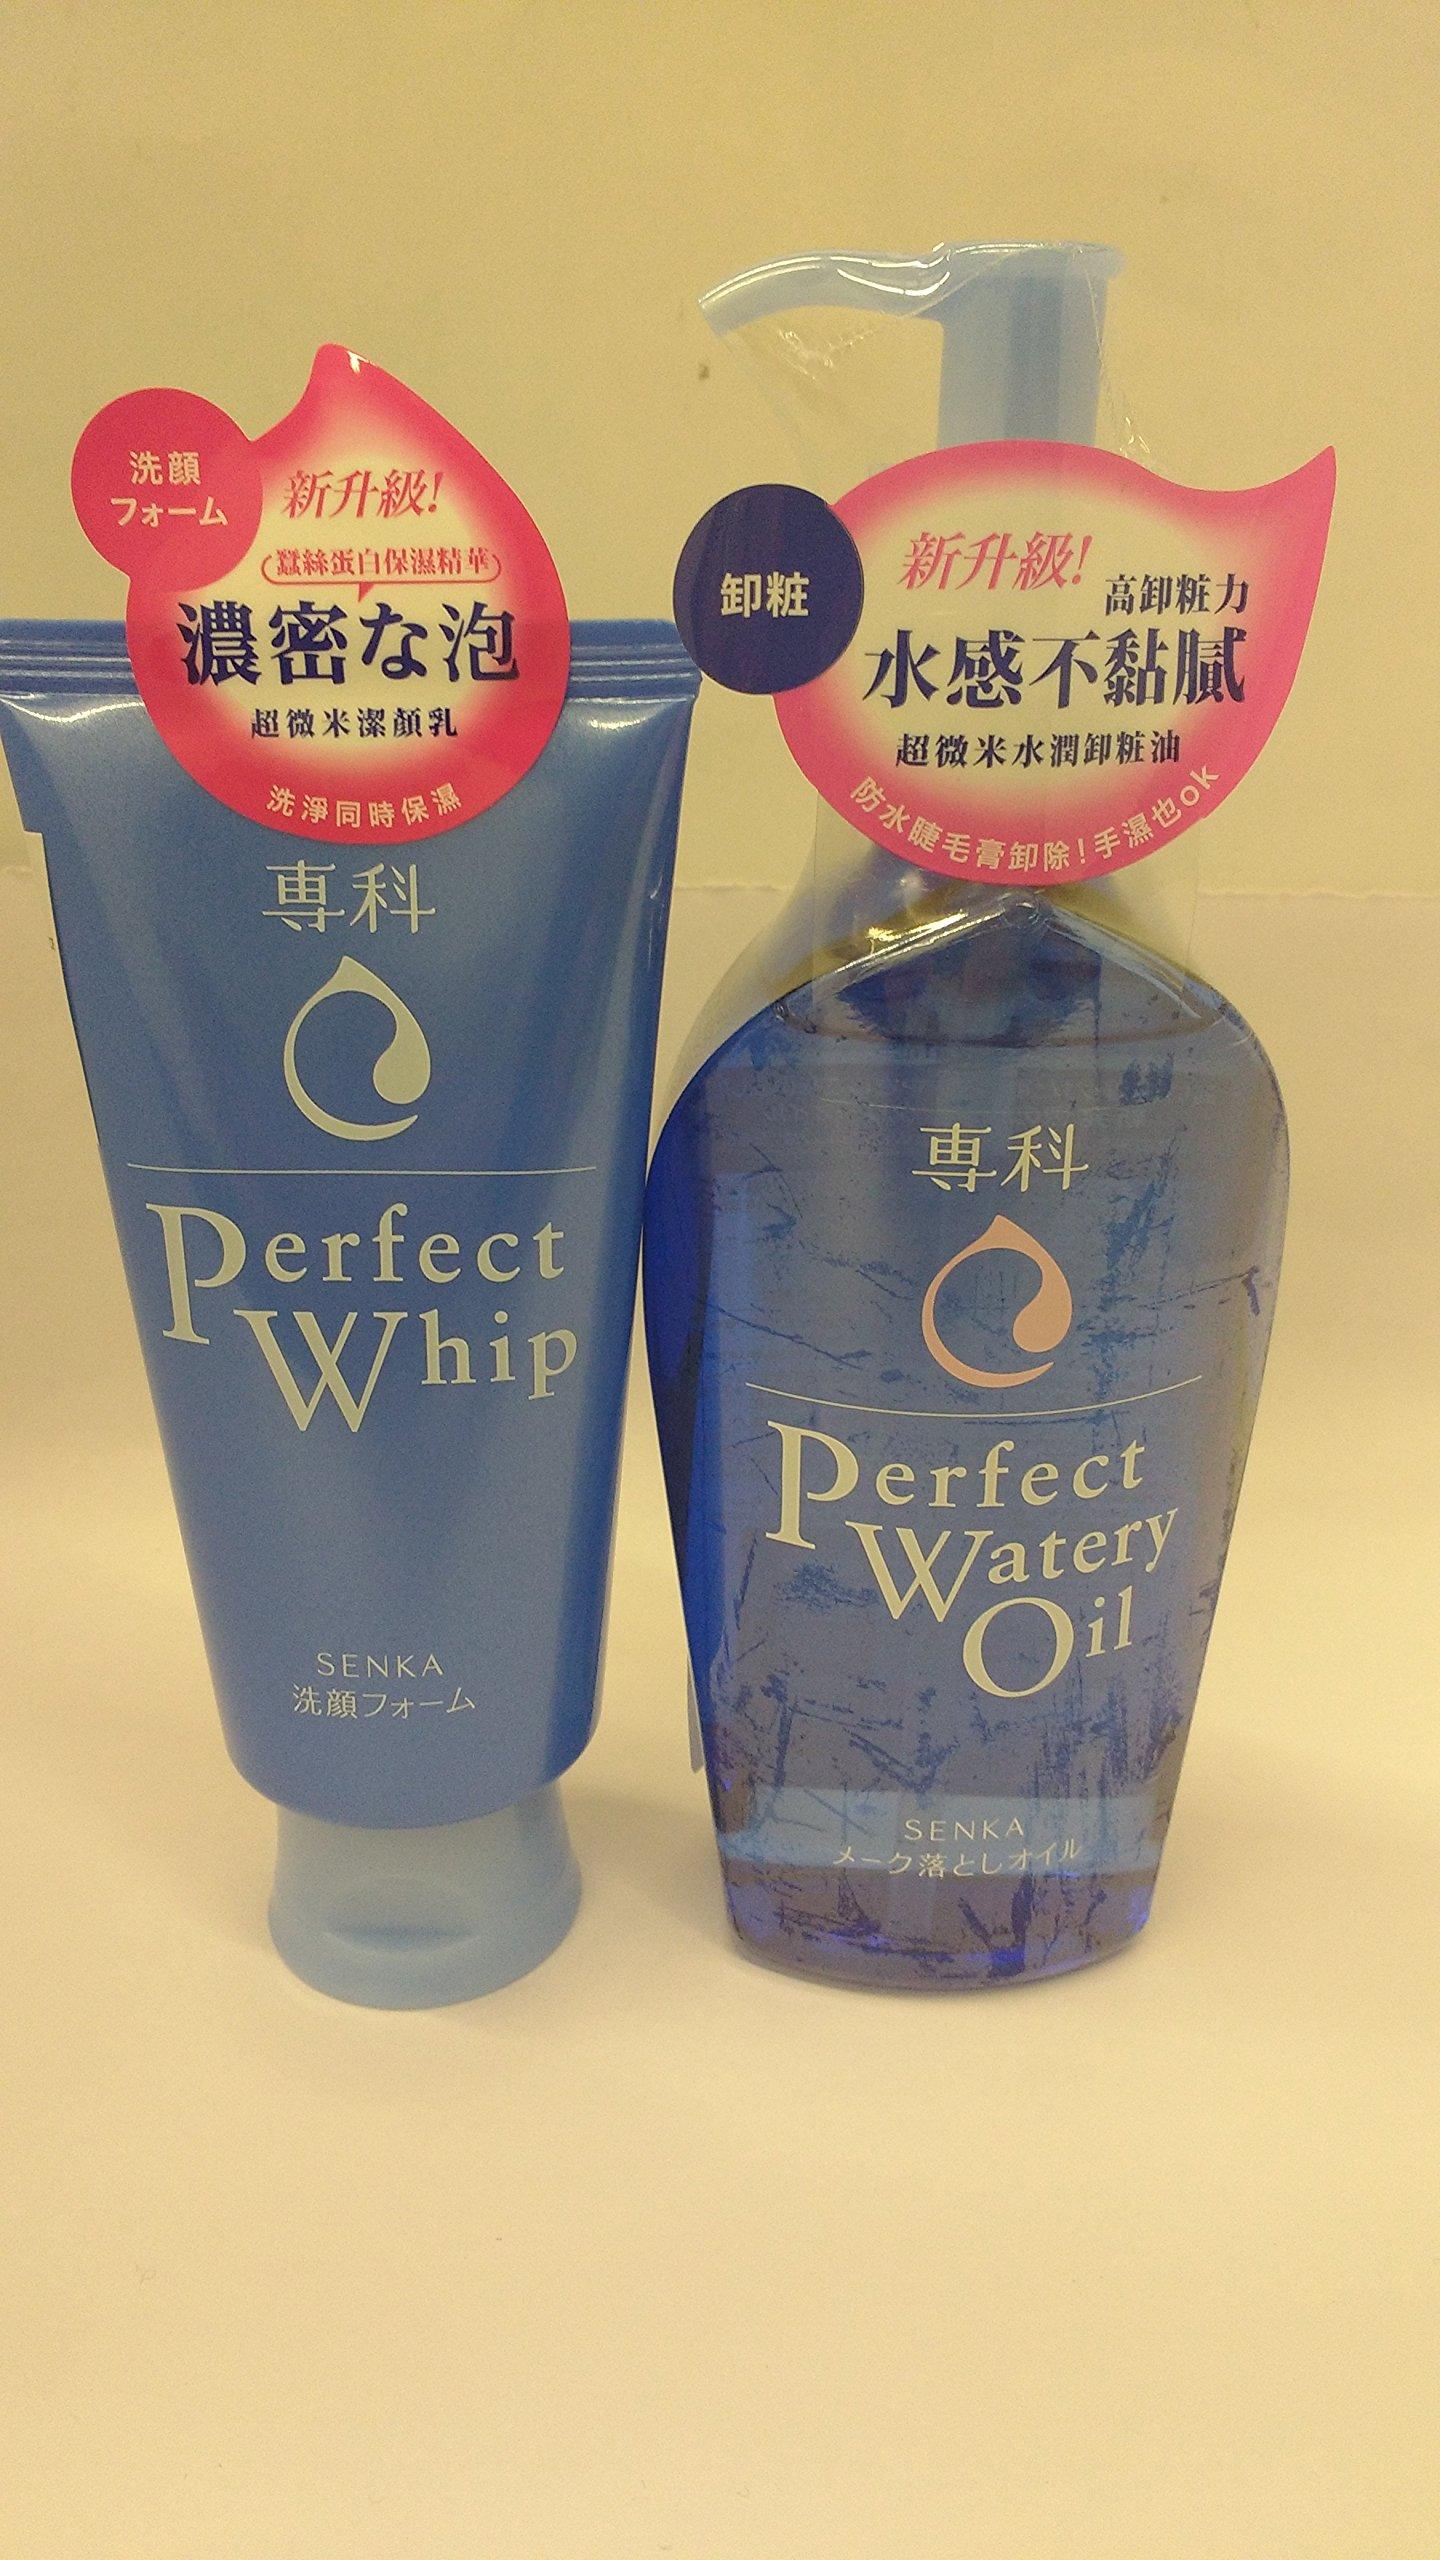 SHISEIDO FT SENGANSENKA PERFECT WHIP FACIAL WASH 4.2oz/120g and PERFECT WATERY OIL 230ML set